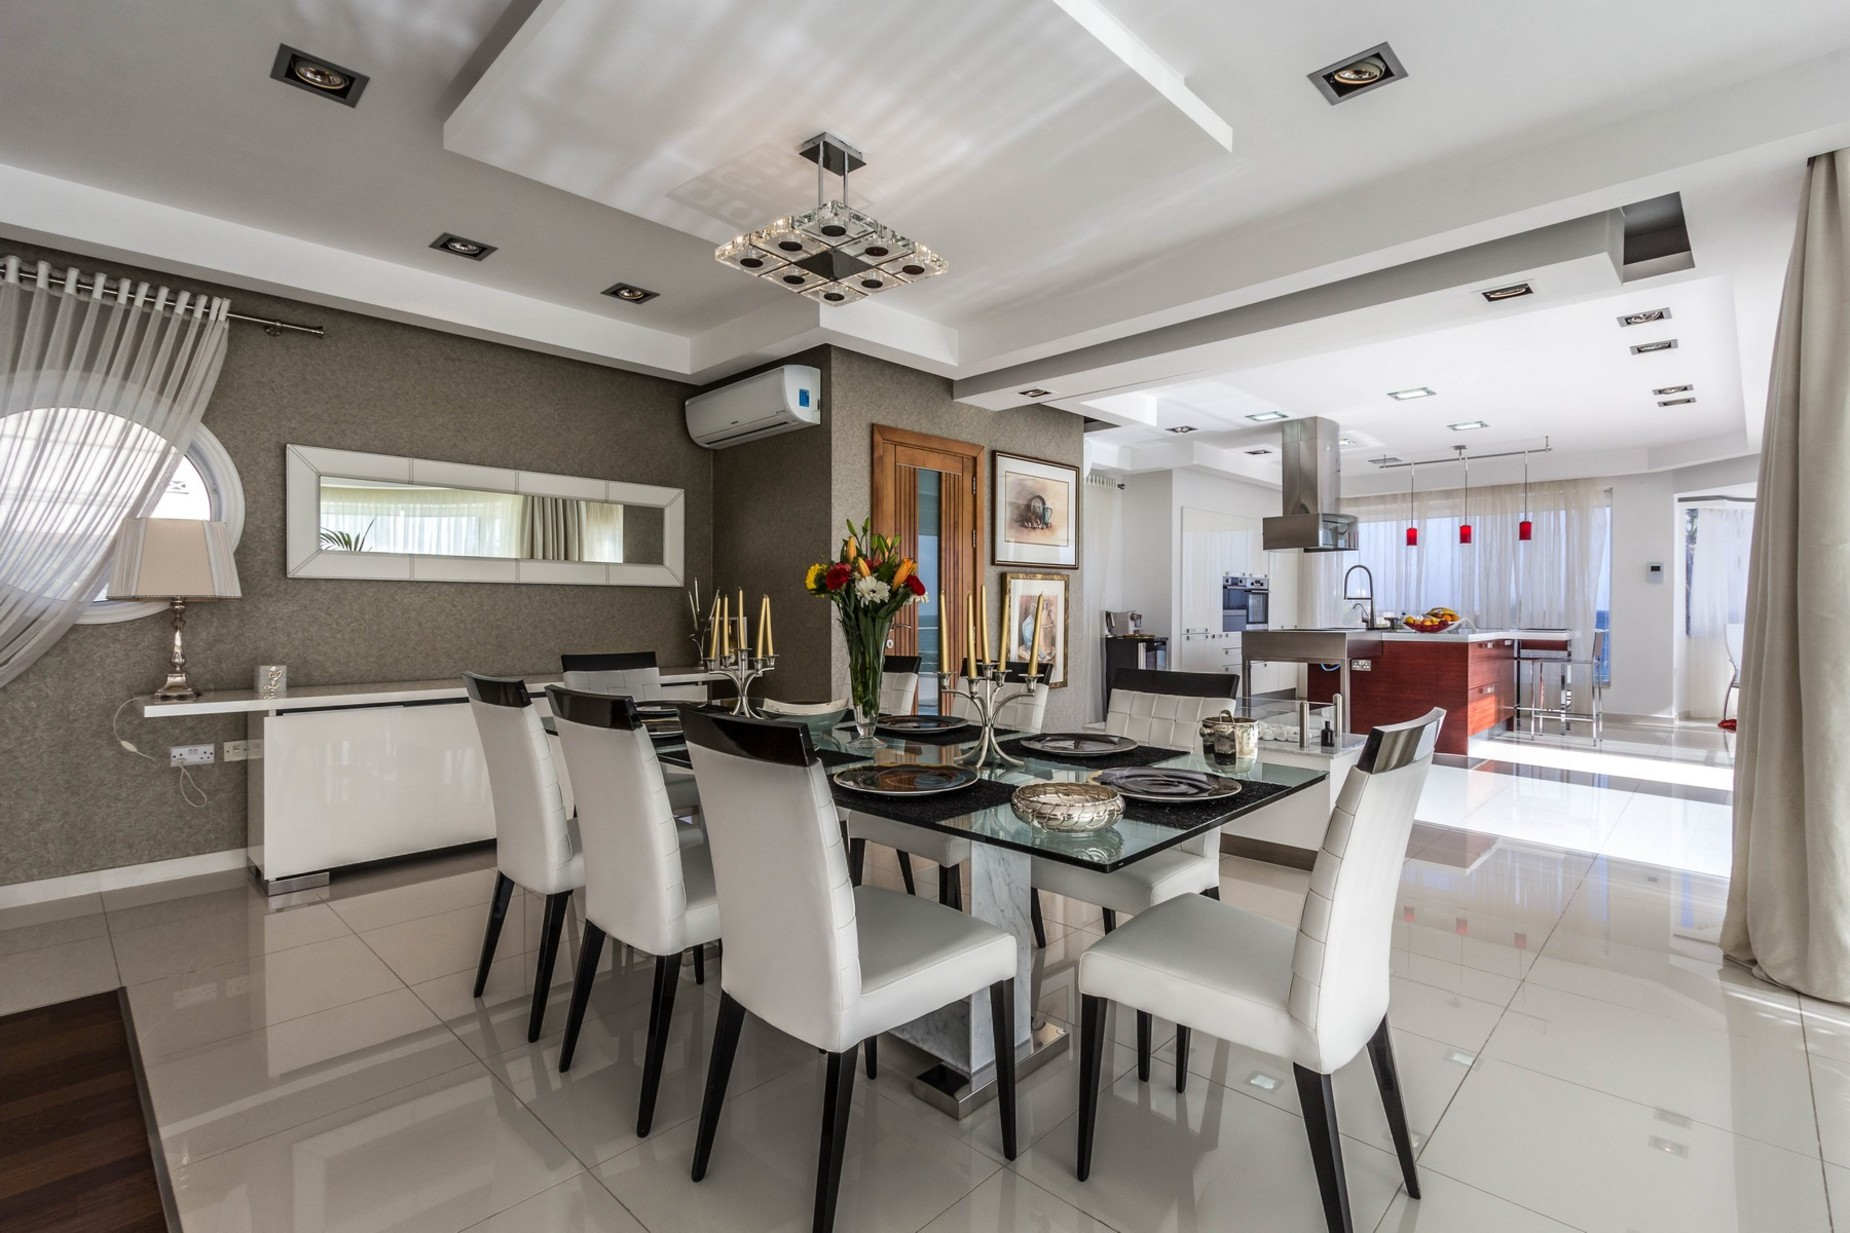 4 bed Villa For Rent in Marsascala, Marsascala - thumb 6